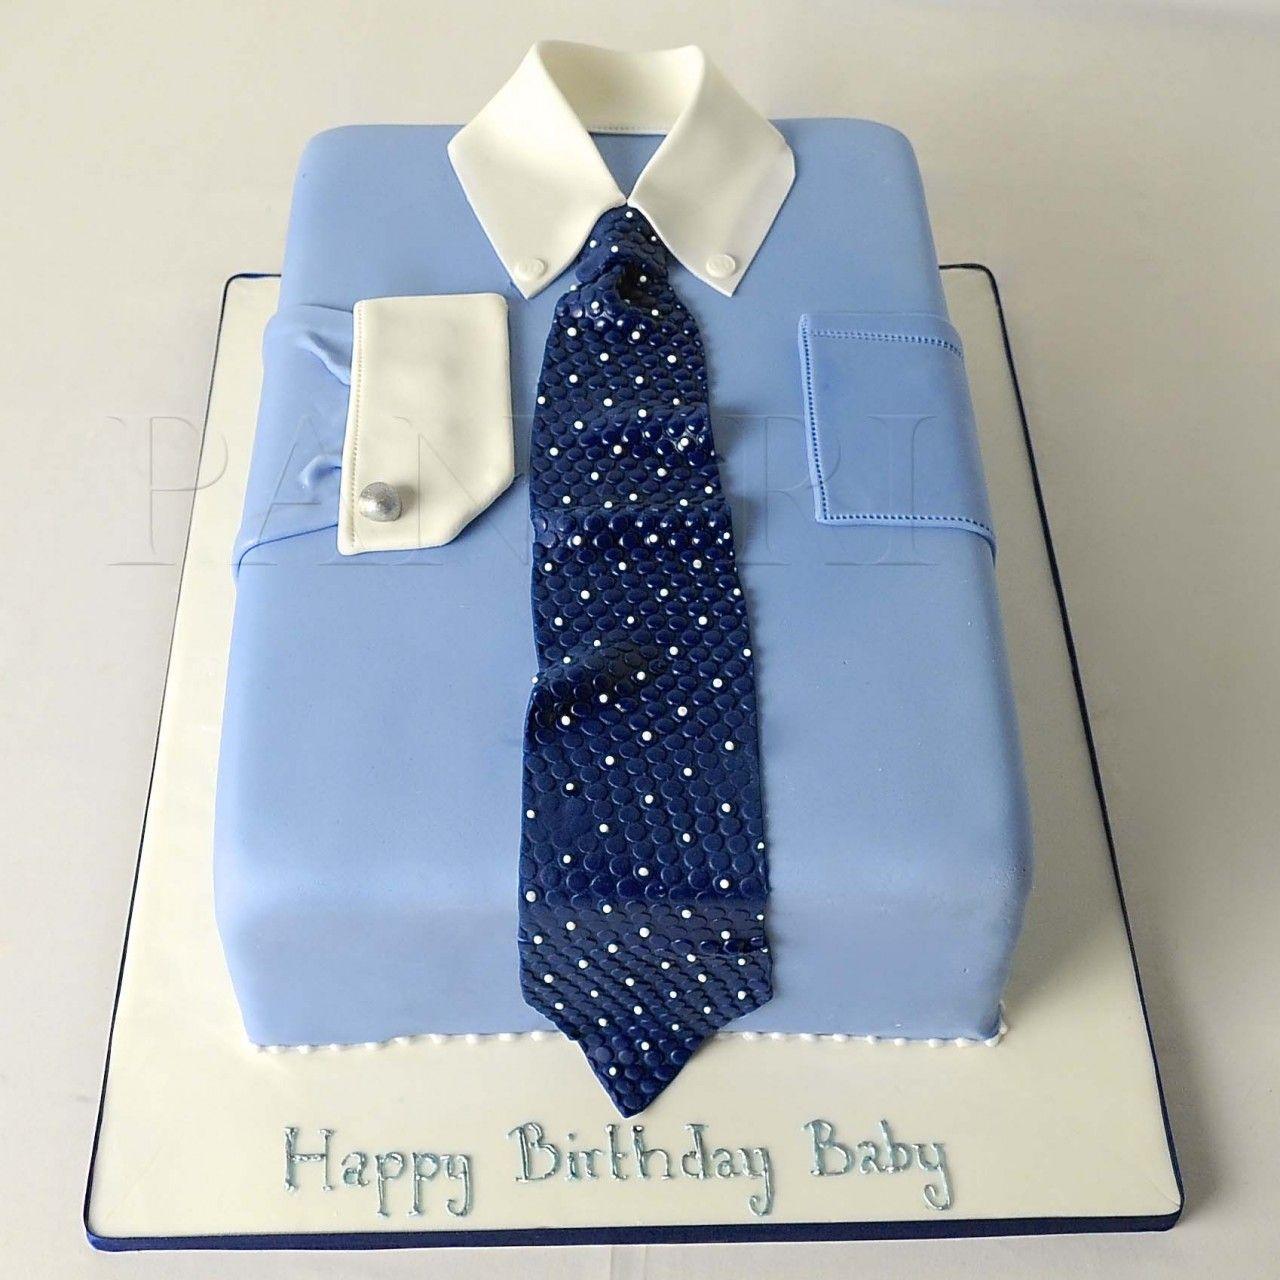 Shirt design cake - Shirt Cakes Google Search